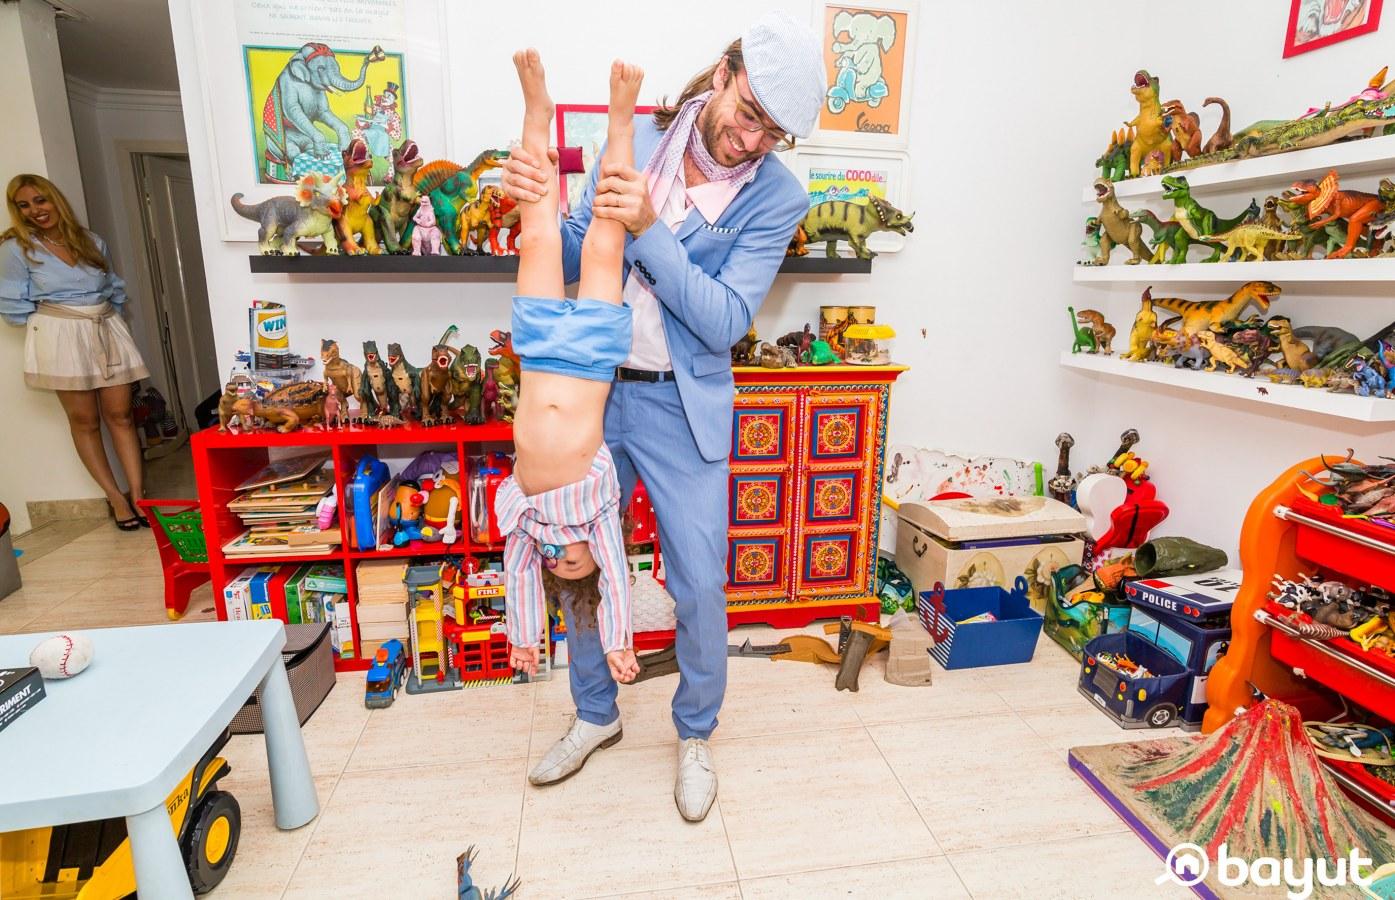 messing around in children's play areas in dubai